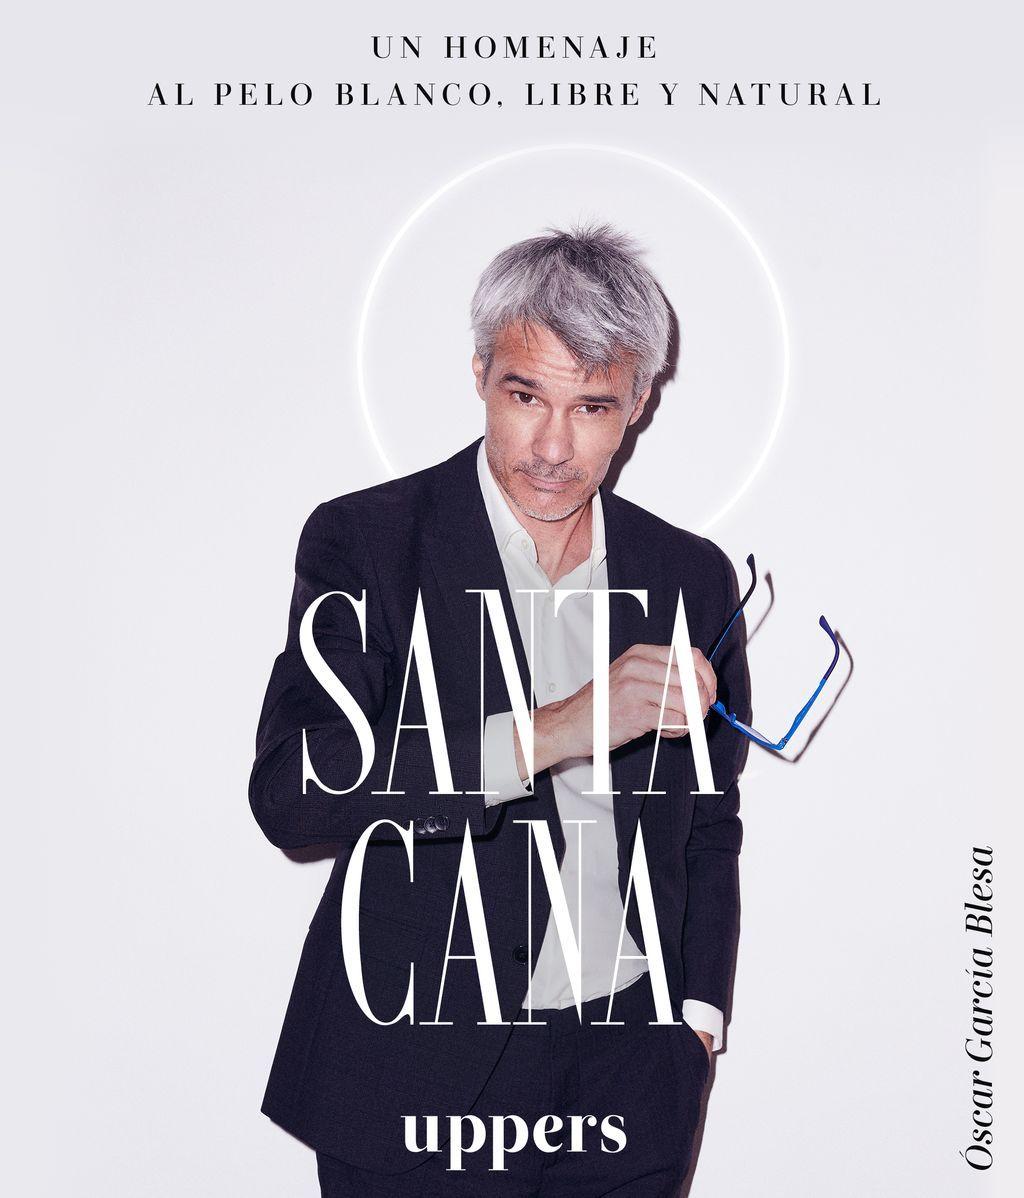 Santa_Cana_Oscar_Garcia_Blanco